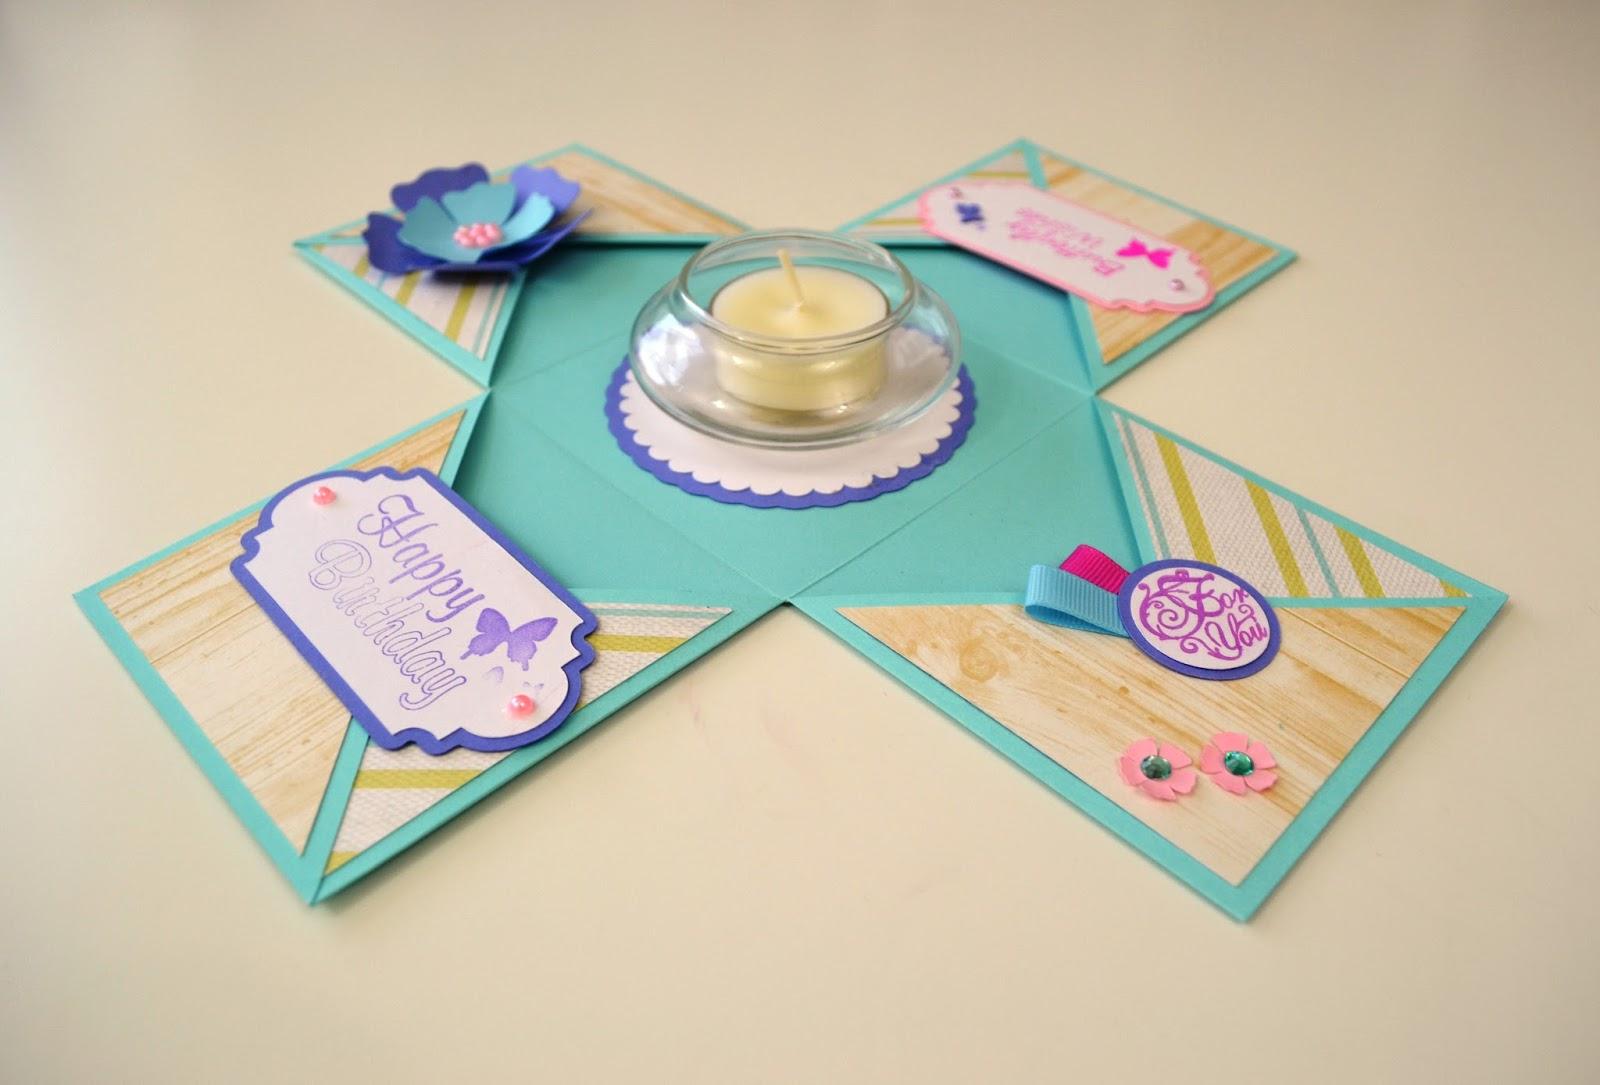 Giulia's Art - DIY Paper Crafts: New Exploding Box model ... - photo#44